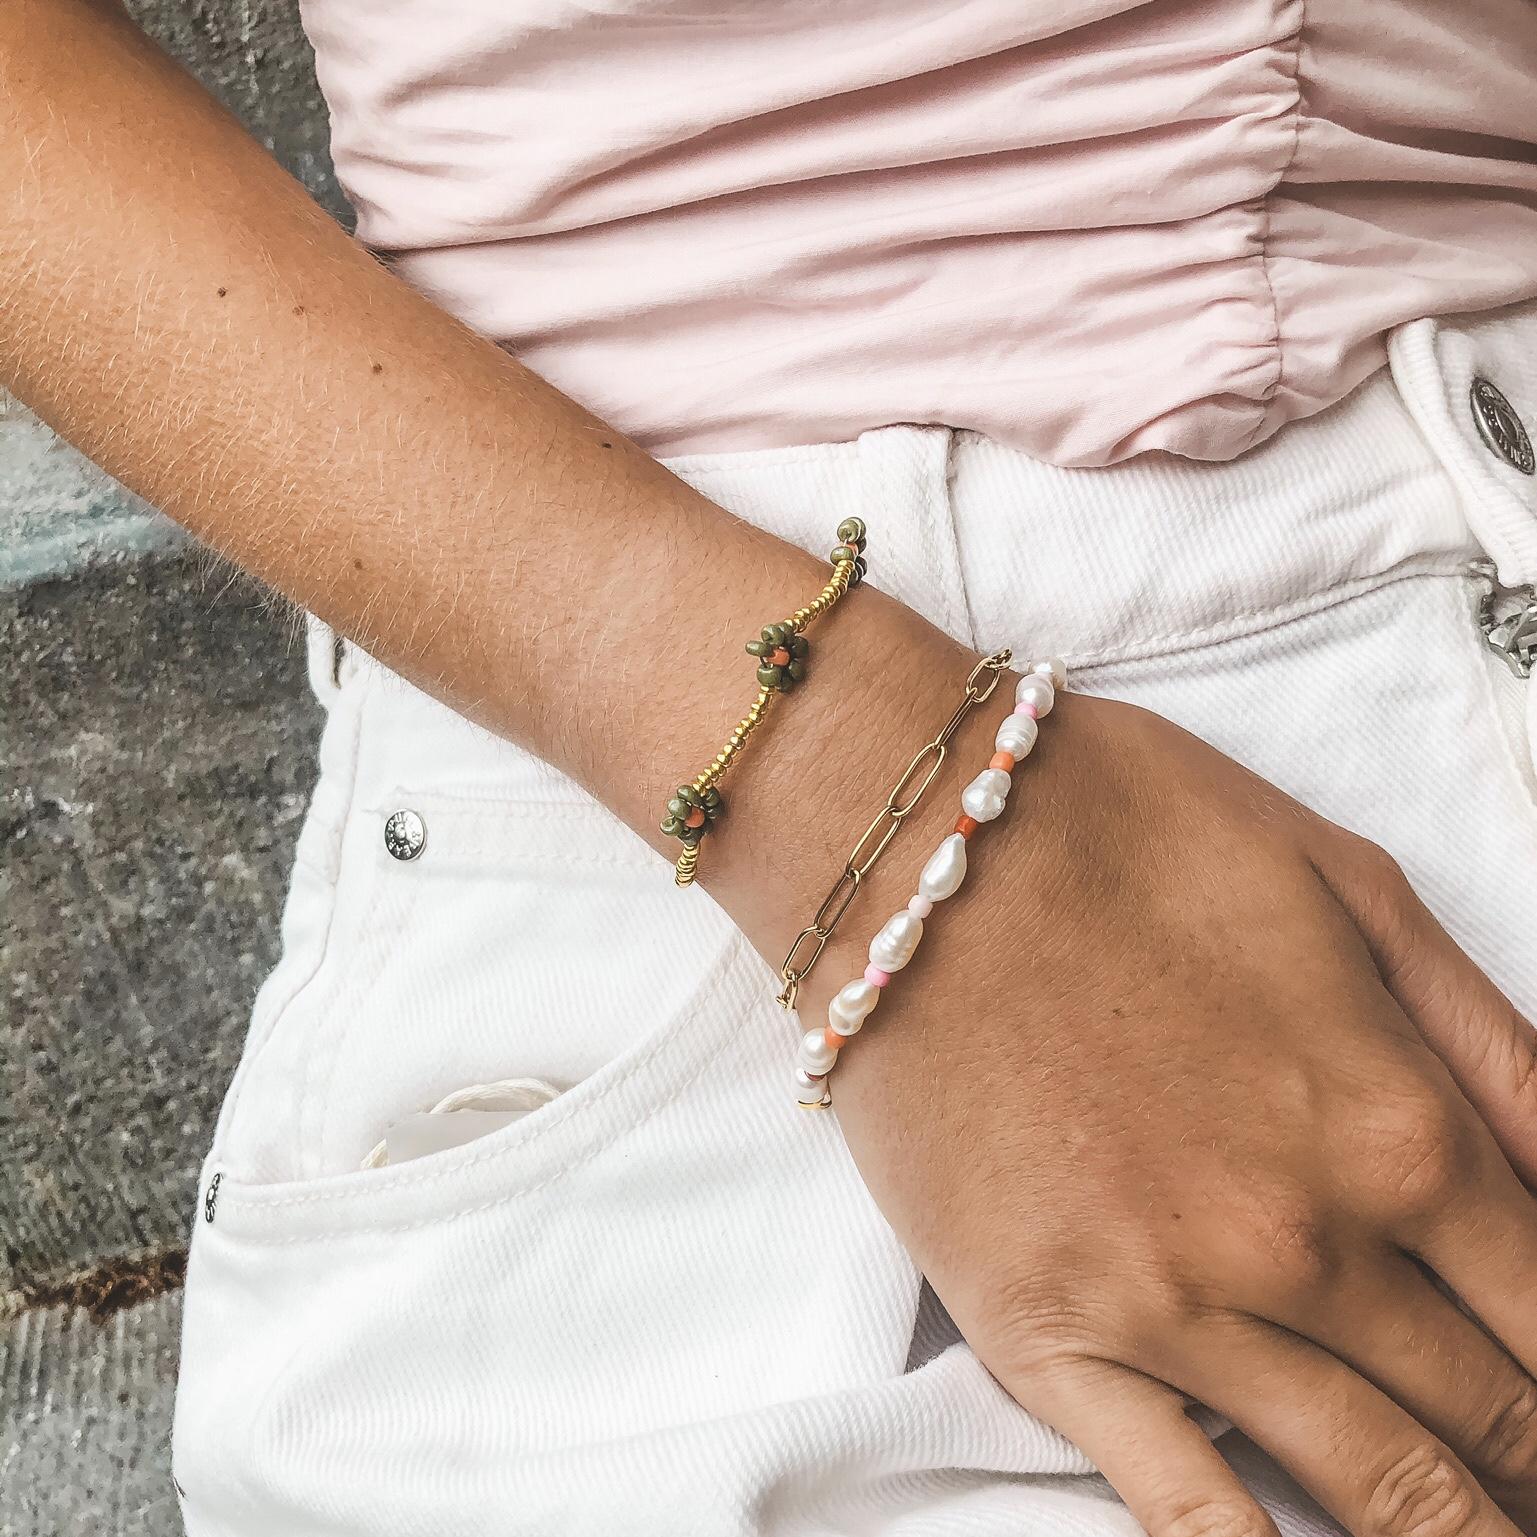 Link chain bracelet gold